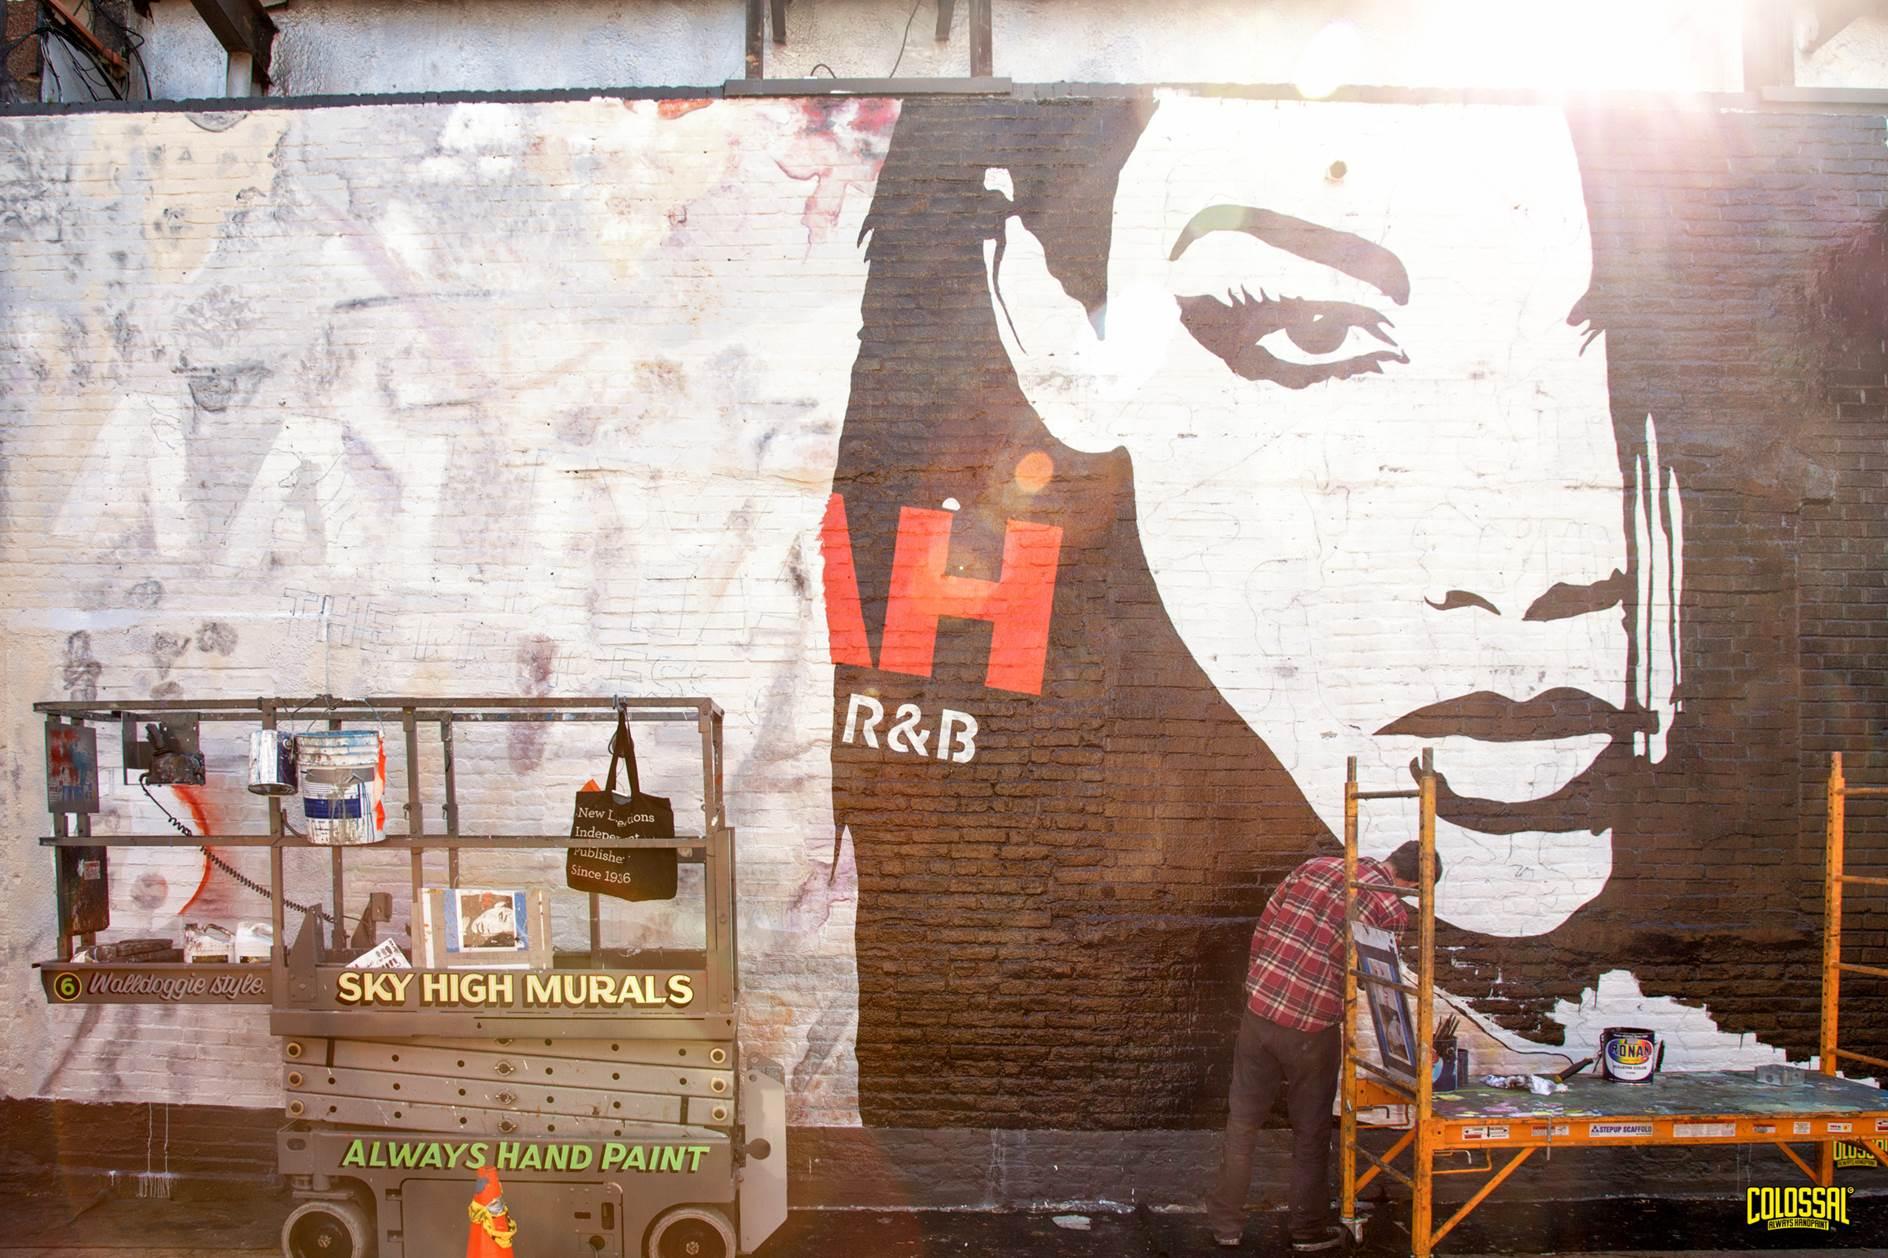 Colossal_Install Image_Aaliyah 2